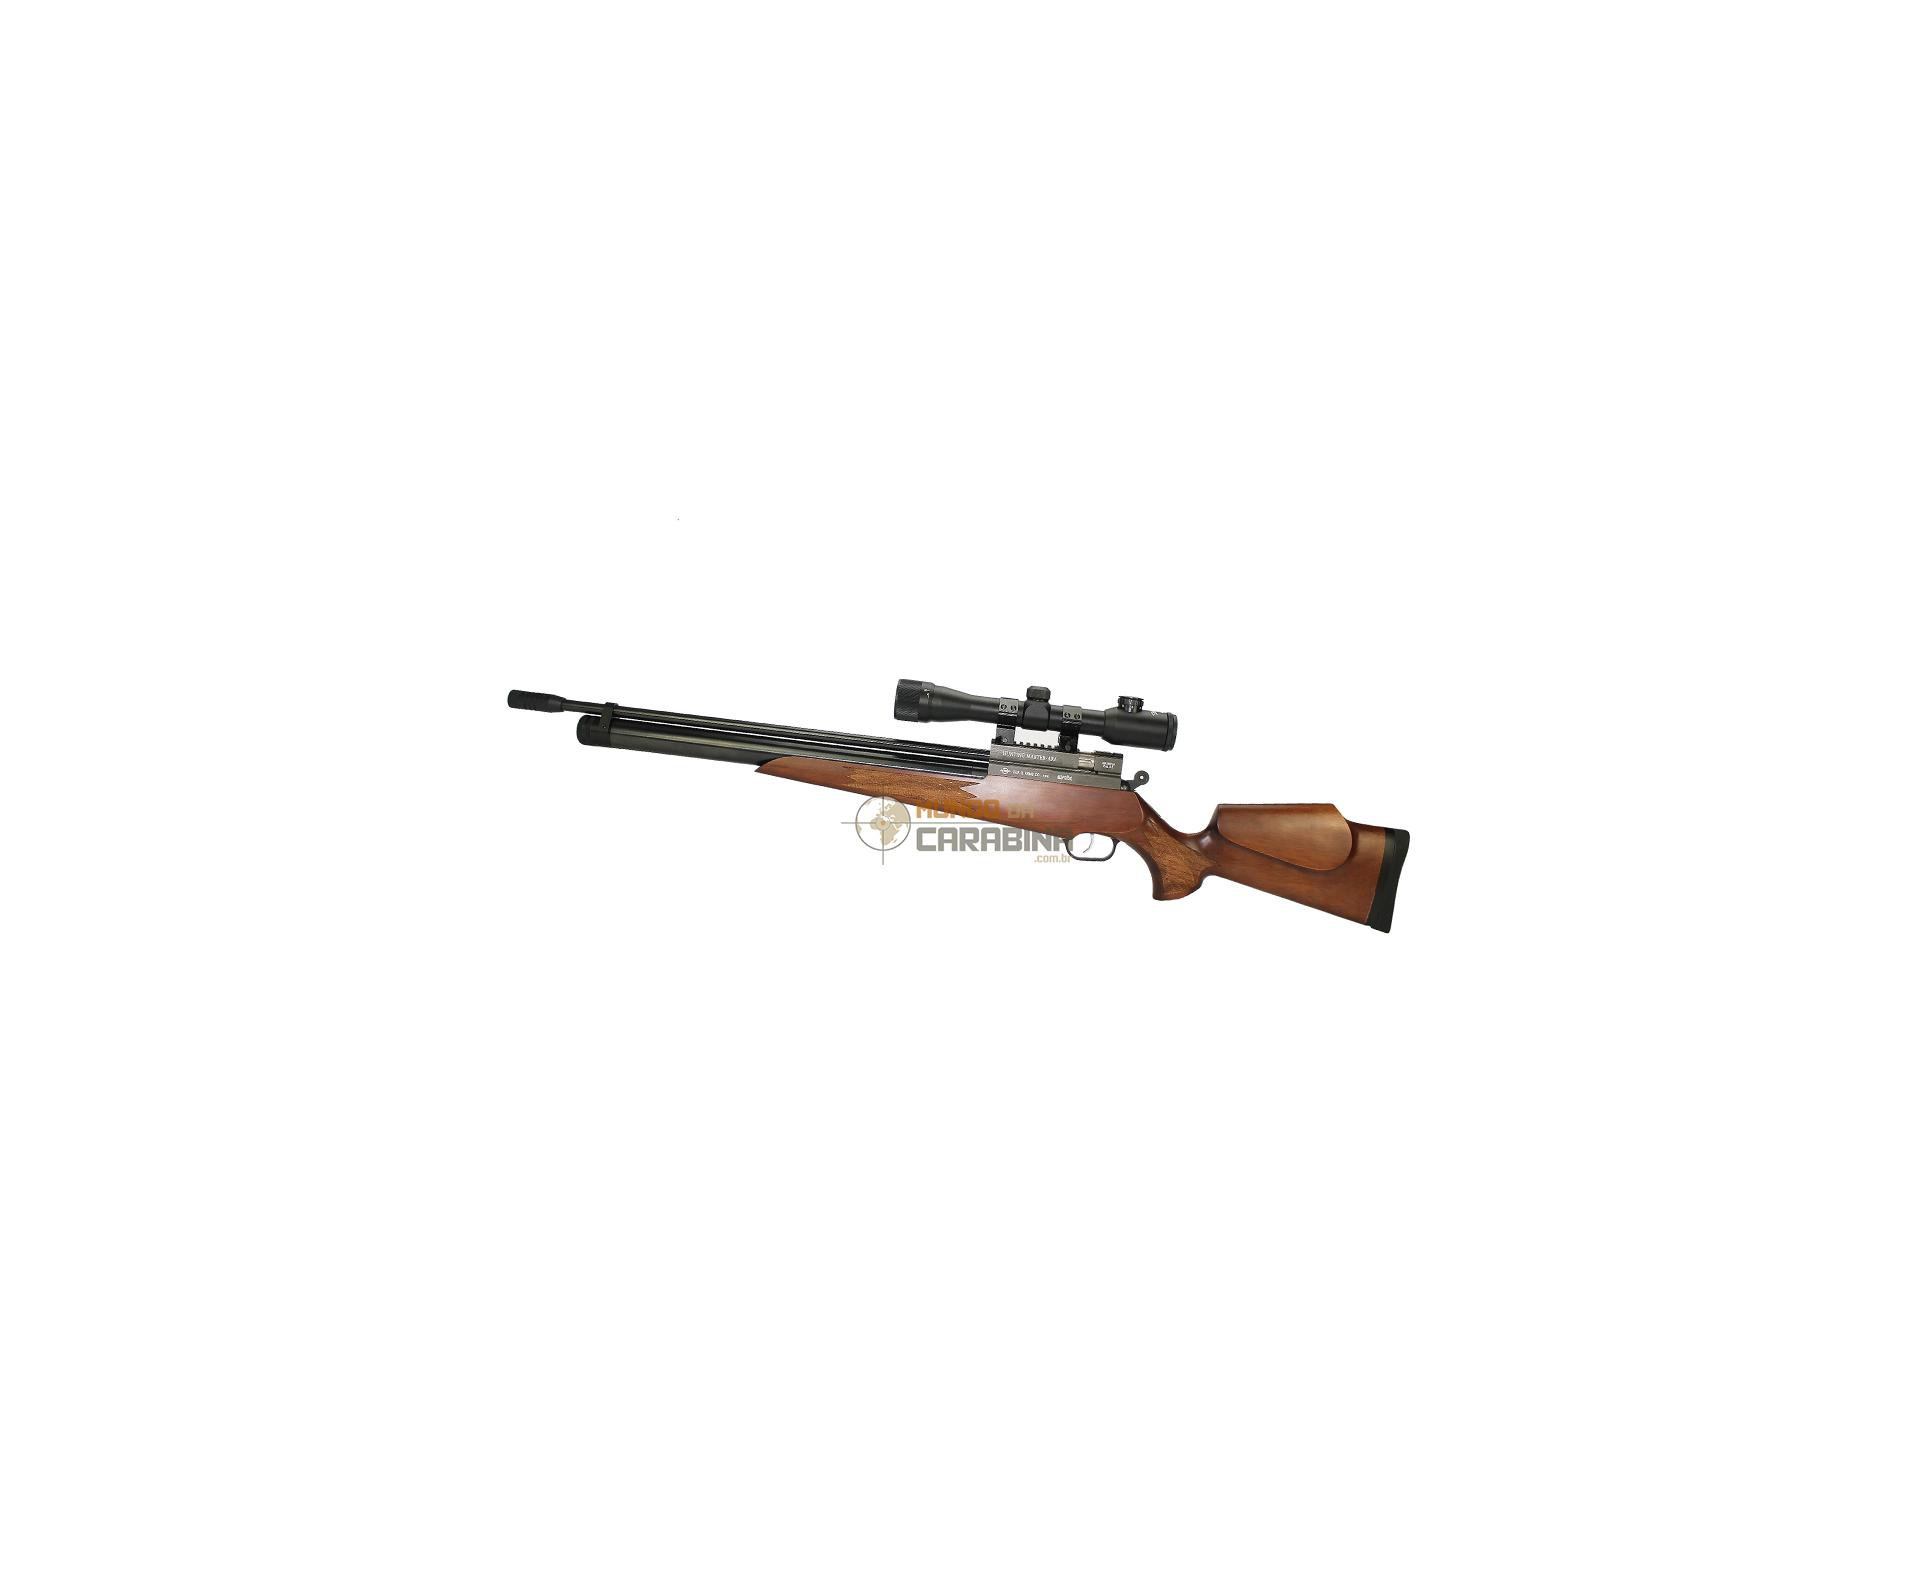 Carabina De Pressão Pcp Hunting Master Ar6 5,5mm - Evanix